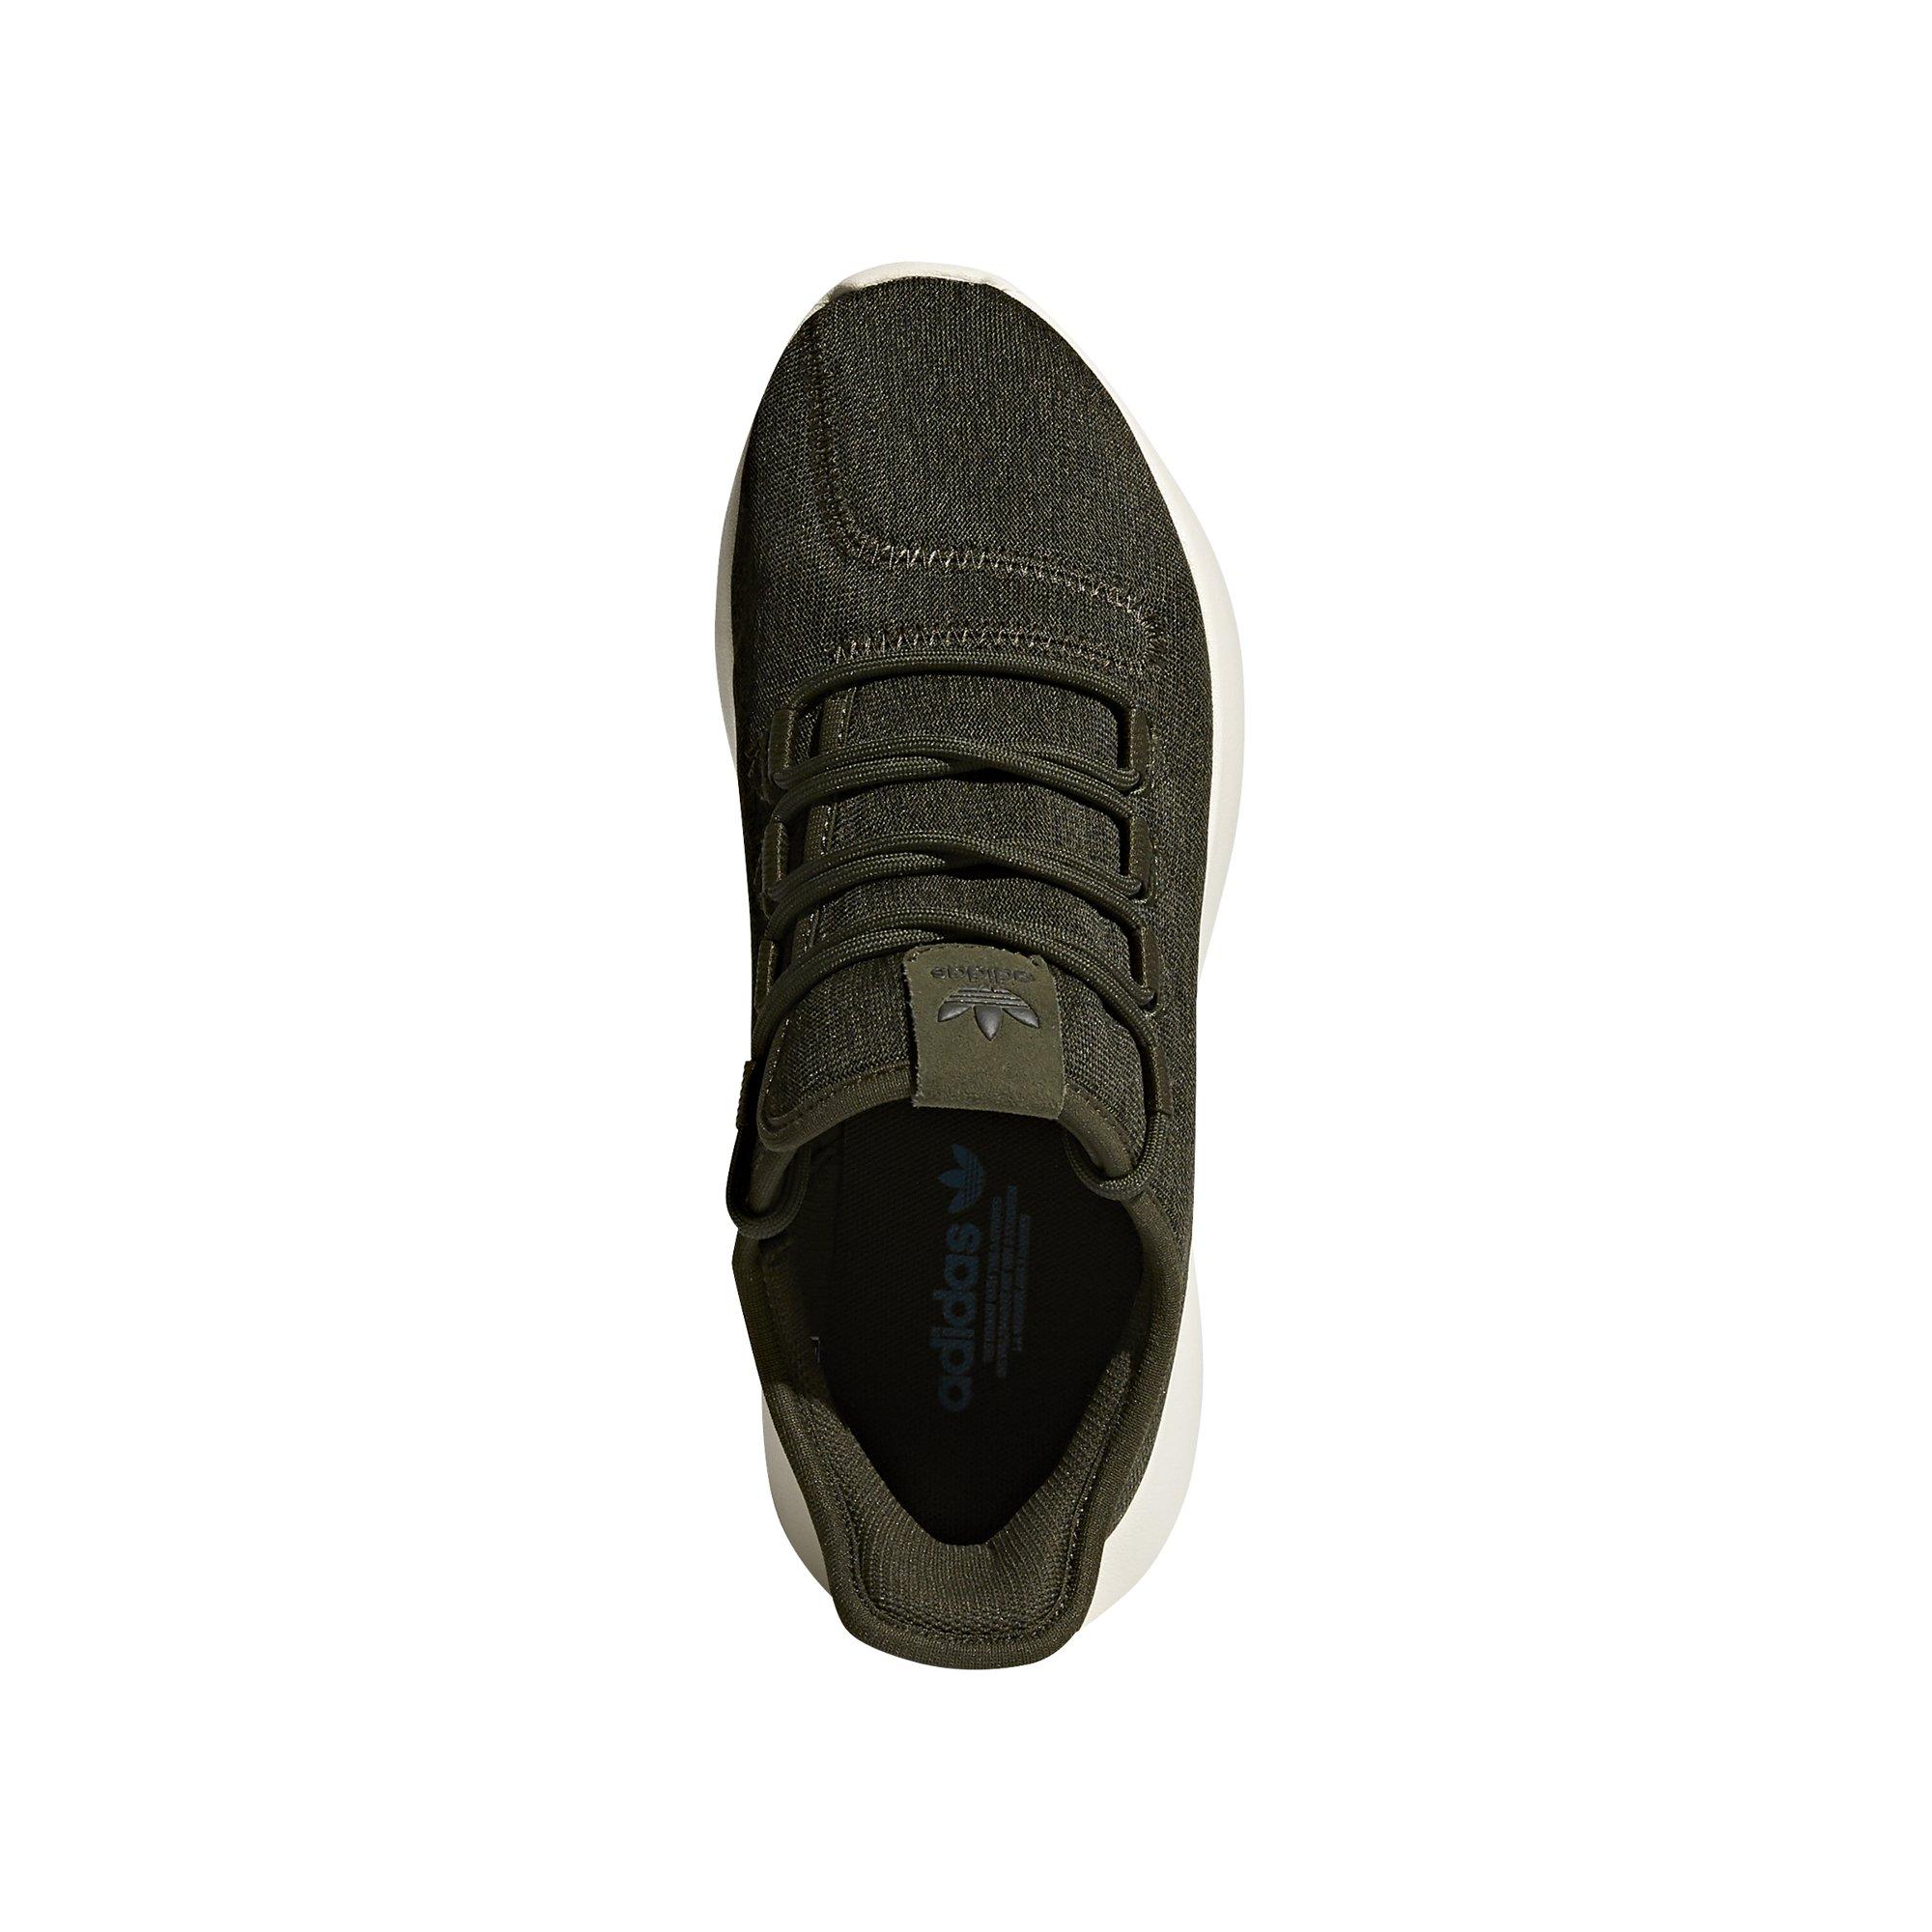 adidas Originals 女士 Tubular Shadow W 时尚运动鞋